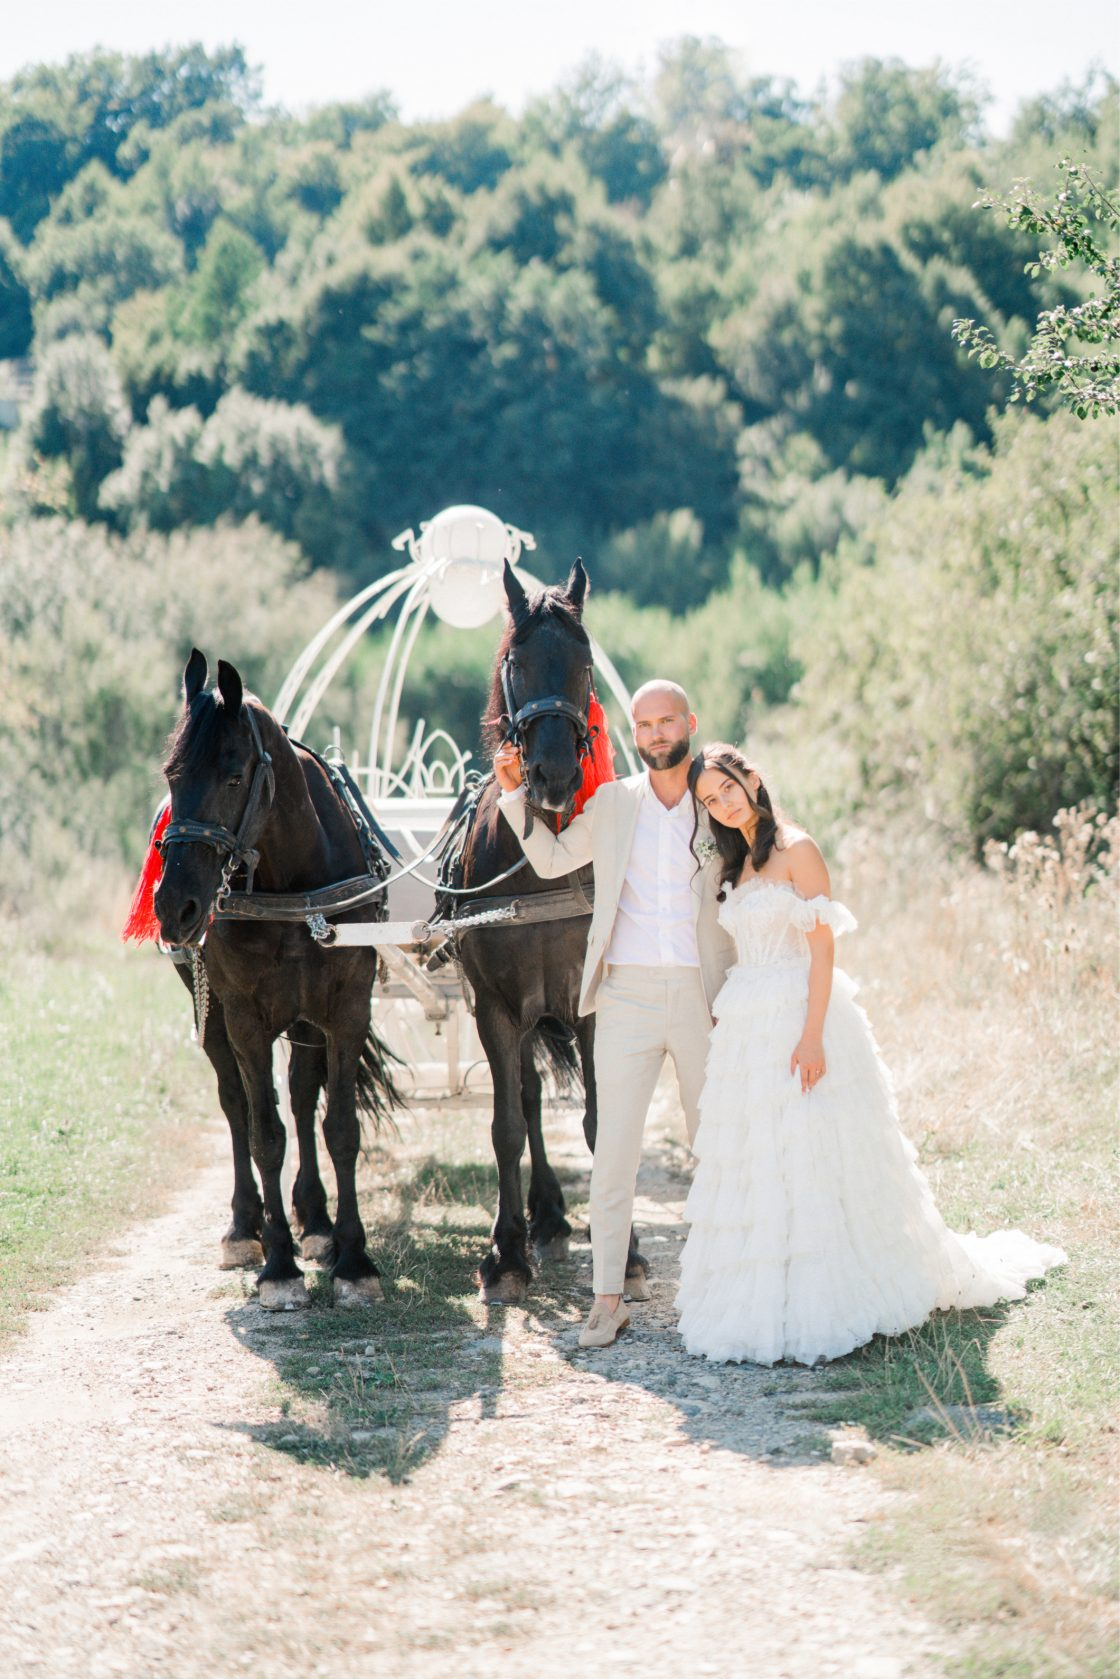 Fairy Tale Wedding Carriage